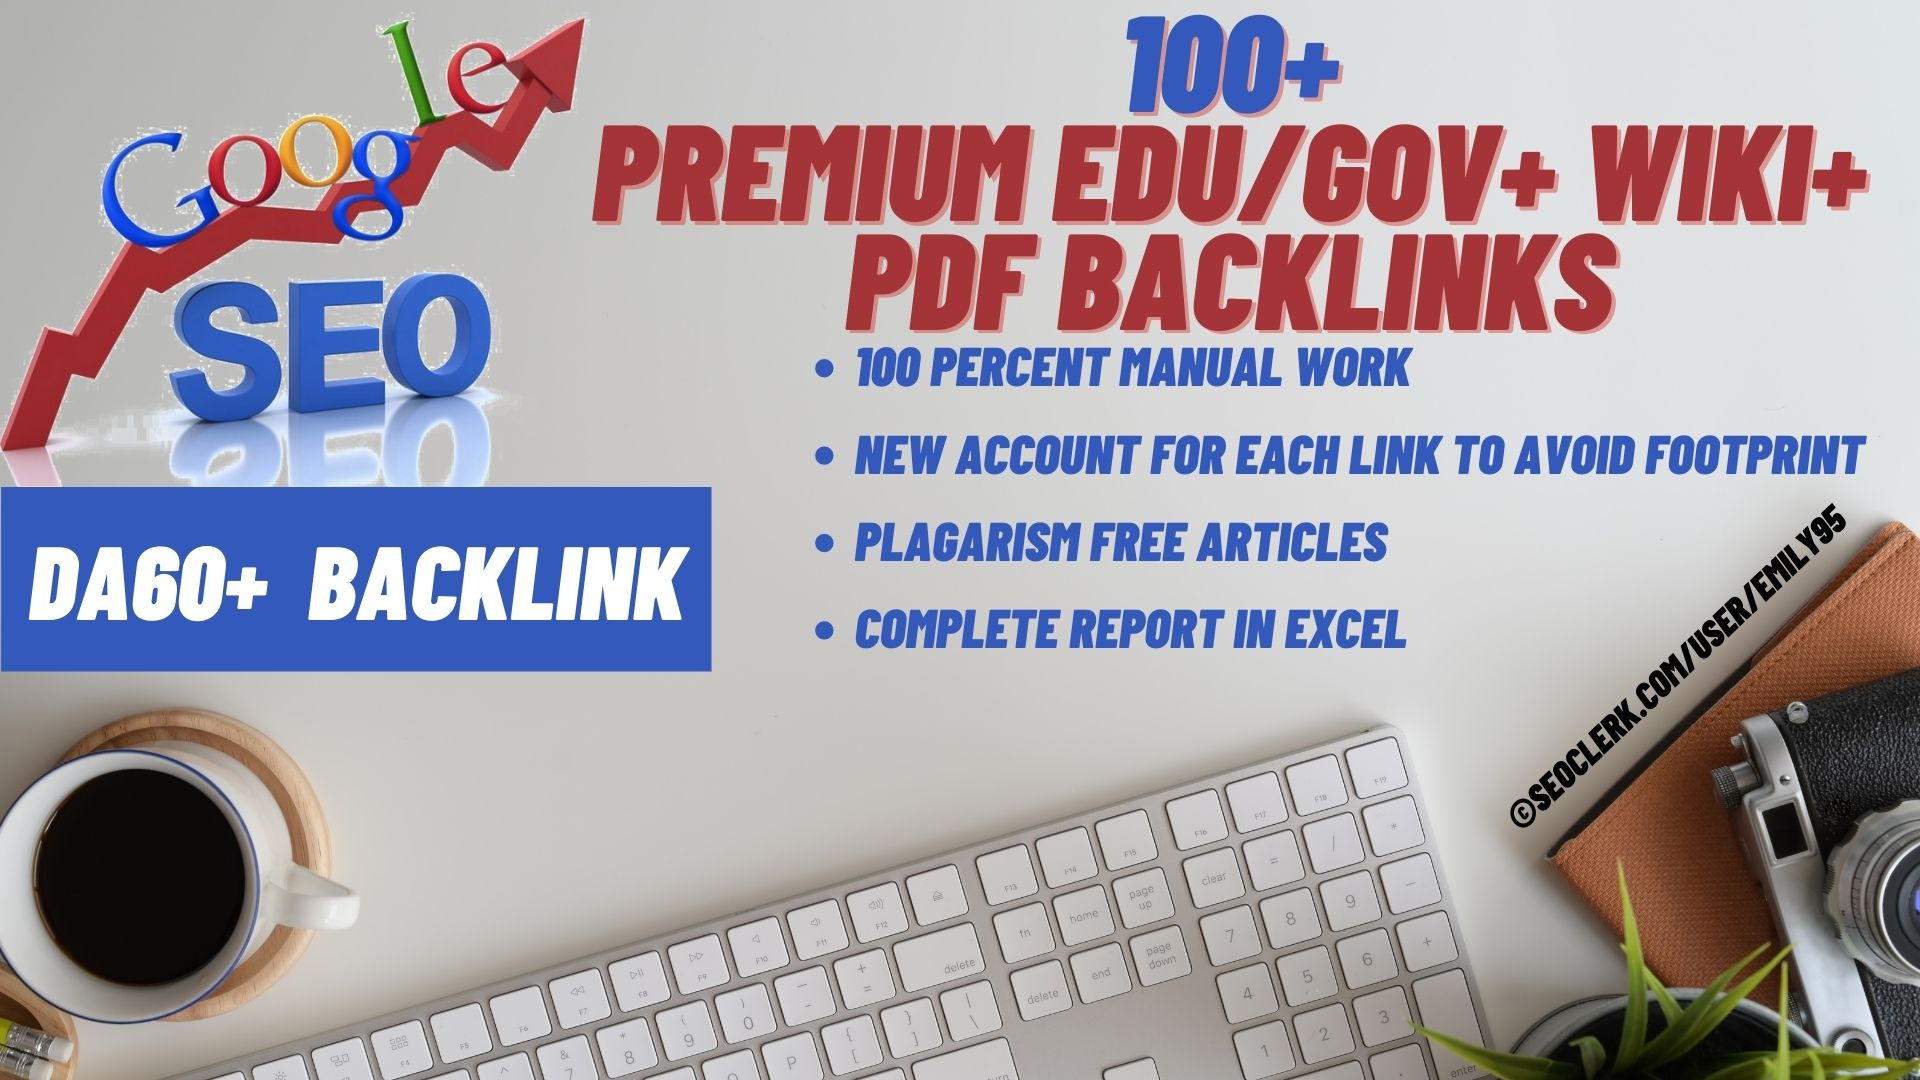 Limited 100+ Power Backlinks from DA60+, Edu/Gov, PDF, Wiki Sites- All High DA PA TF CF sites